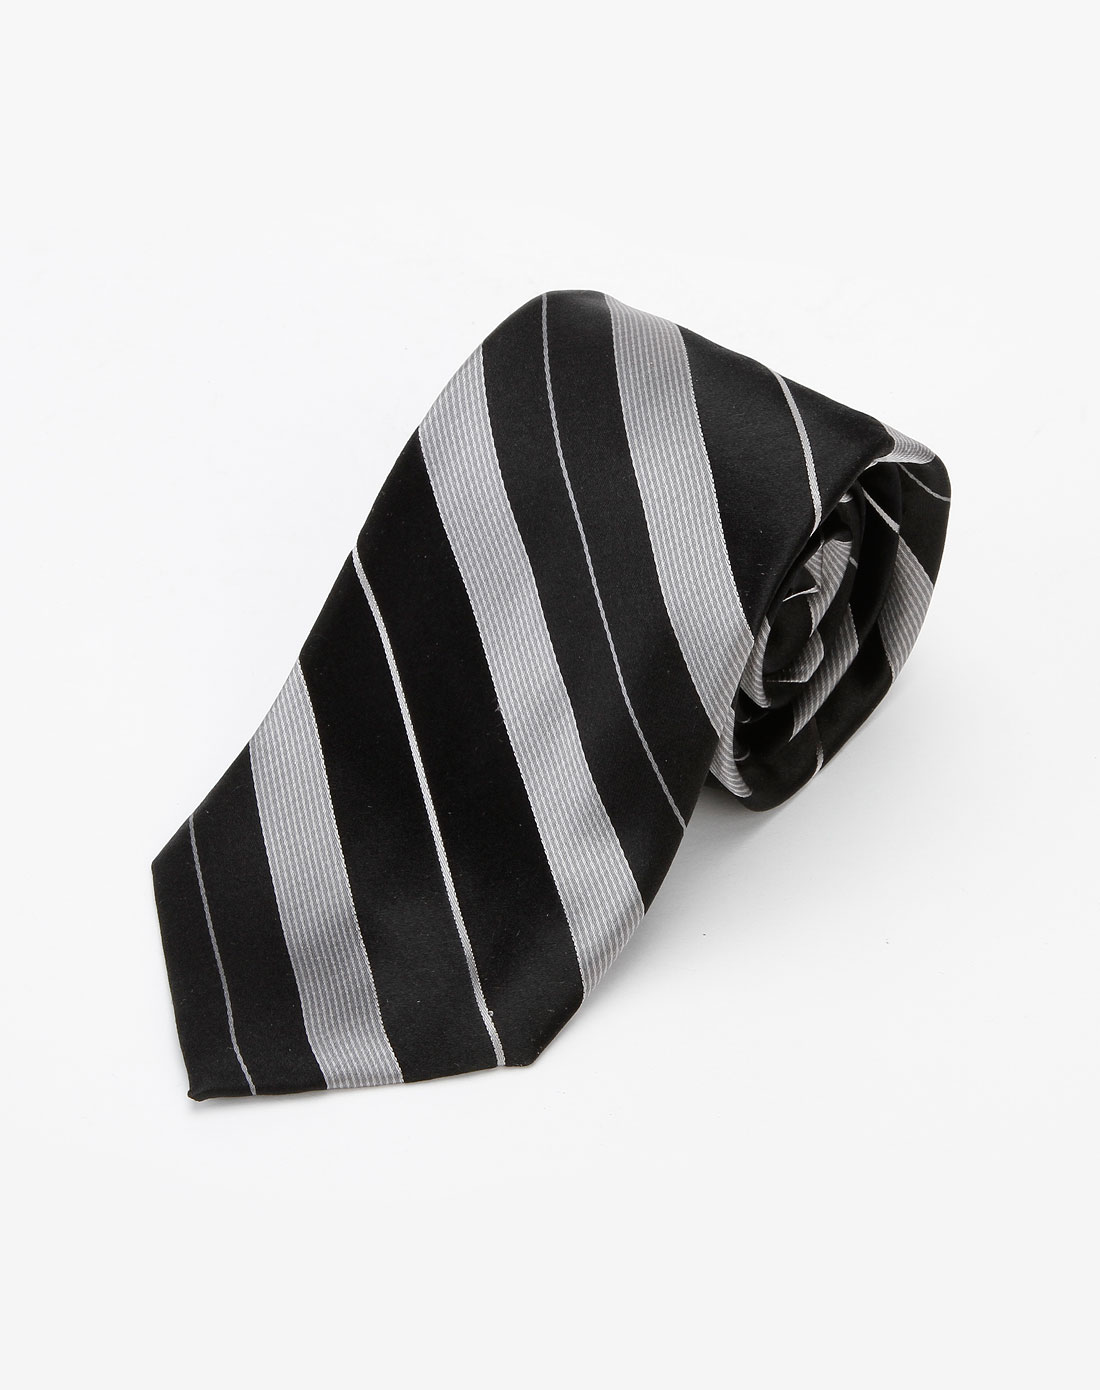 dkny 男款黑/灰色斜条纹领带